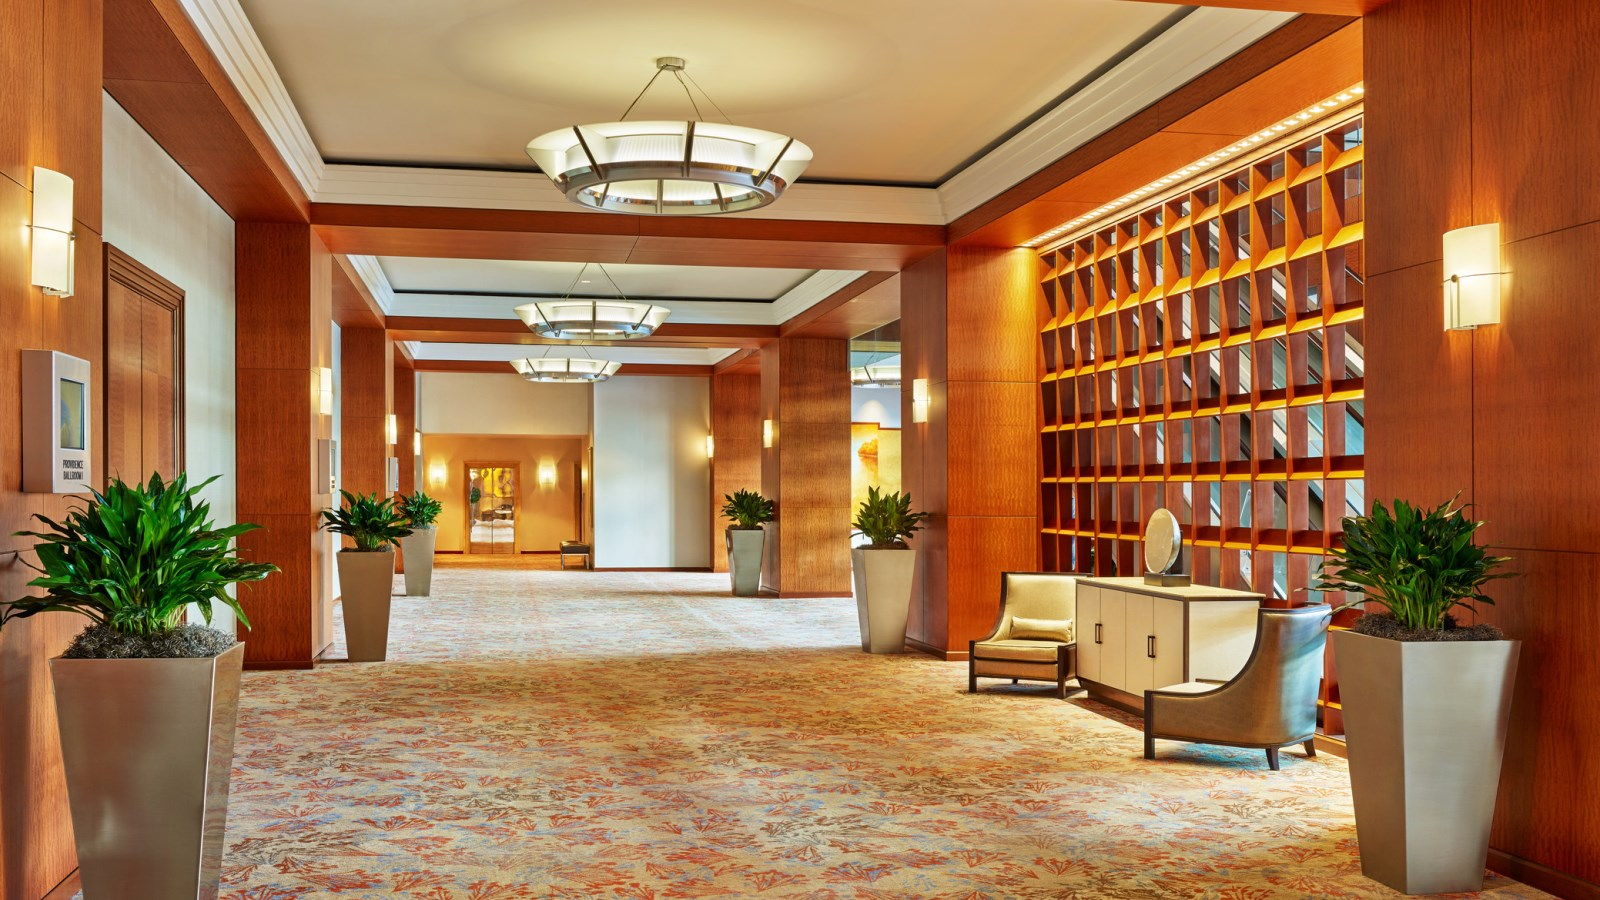 The Providence Foyer